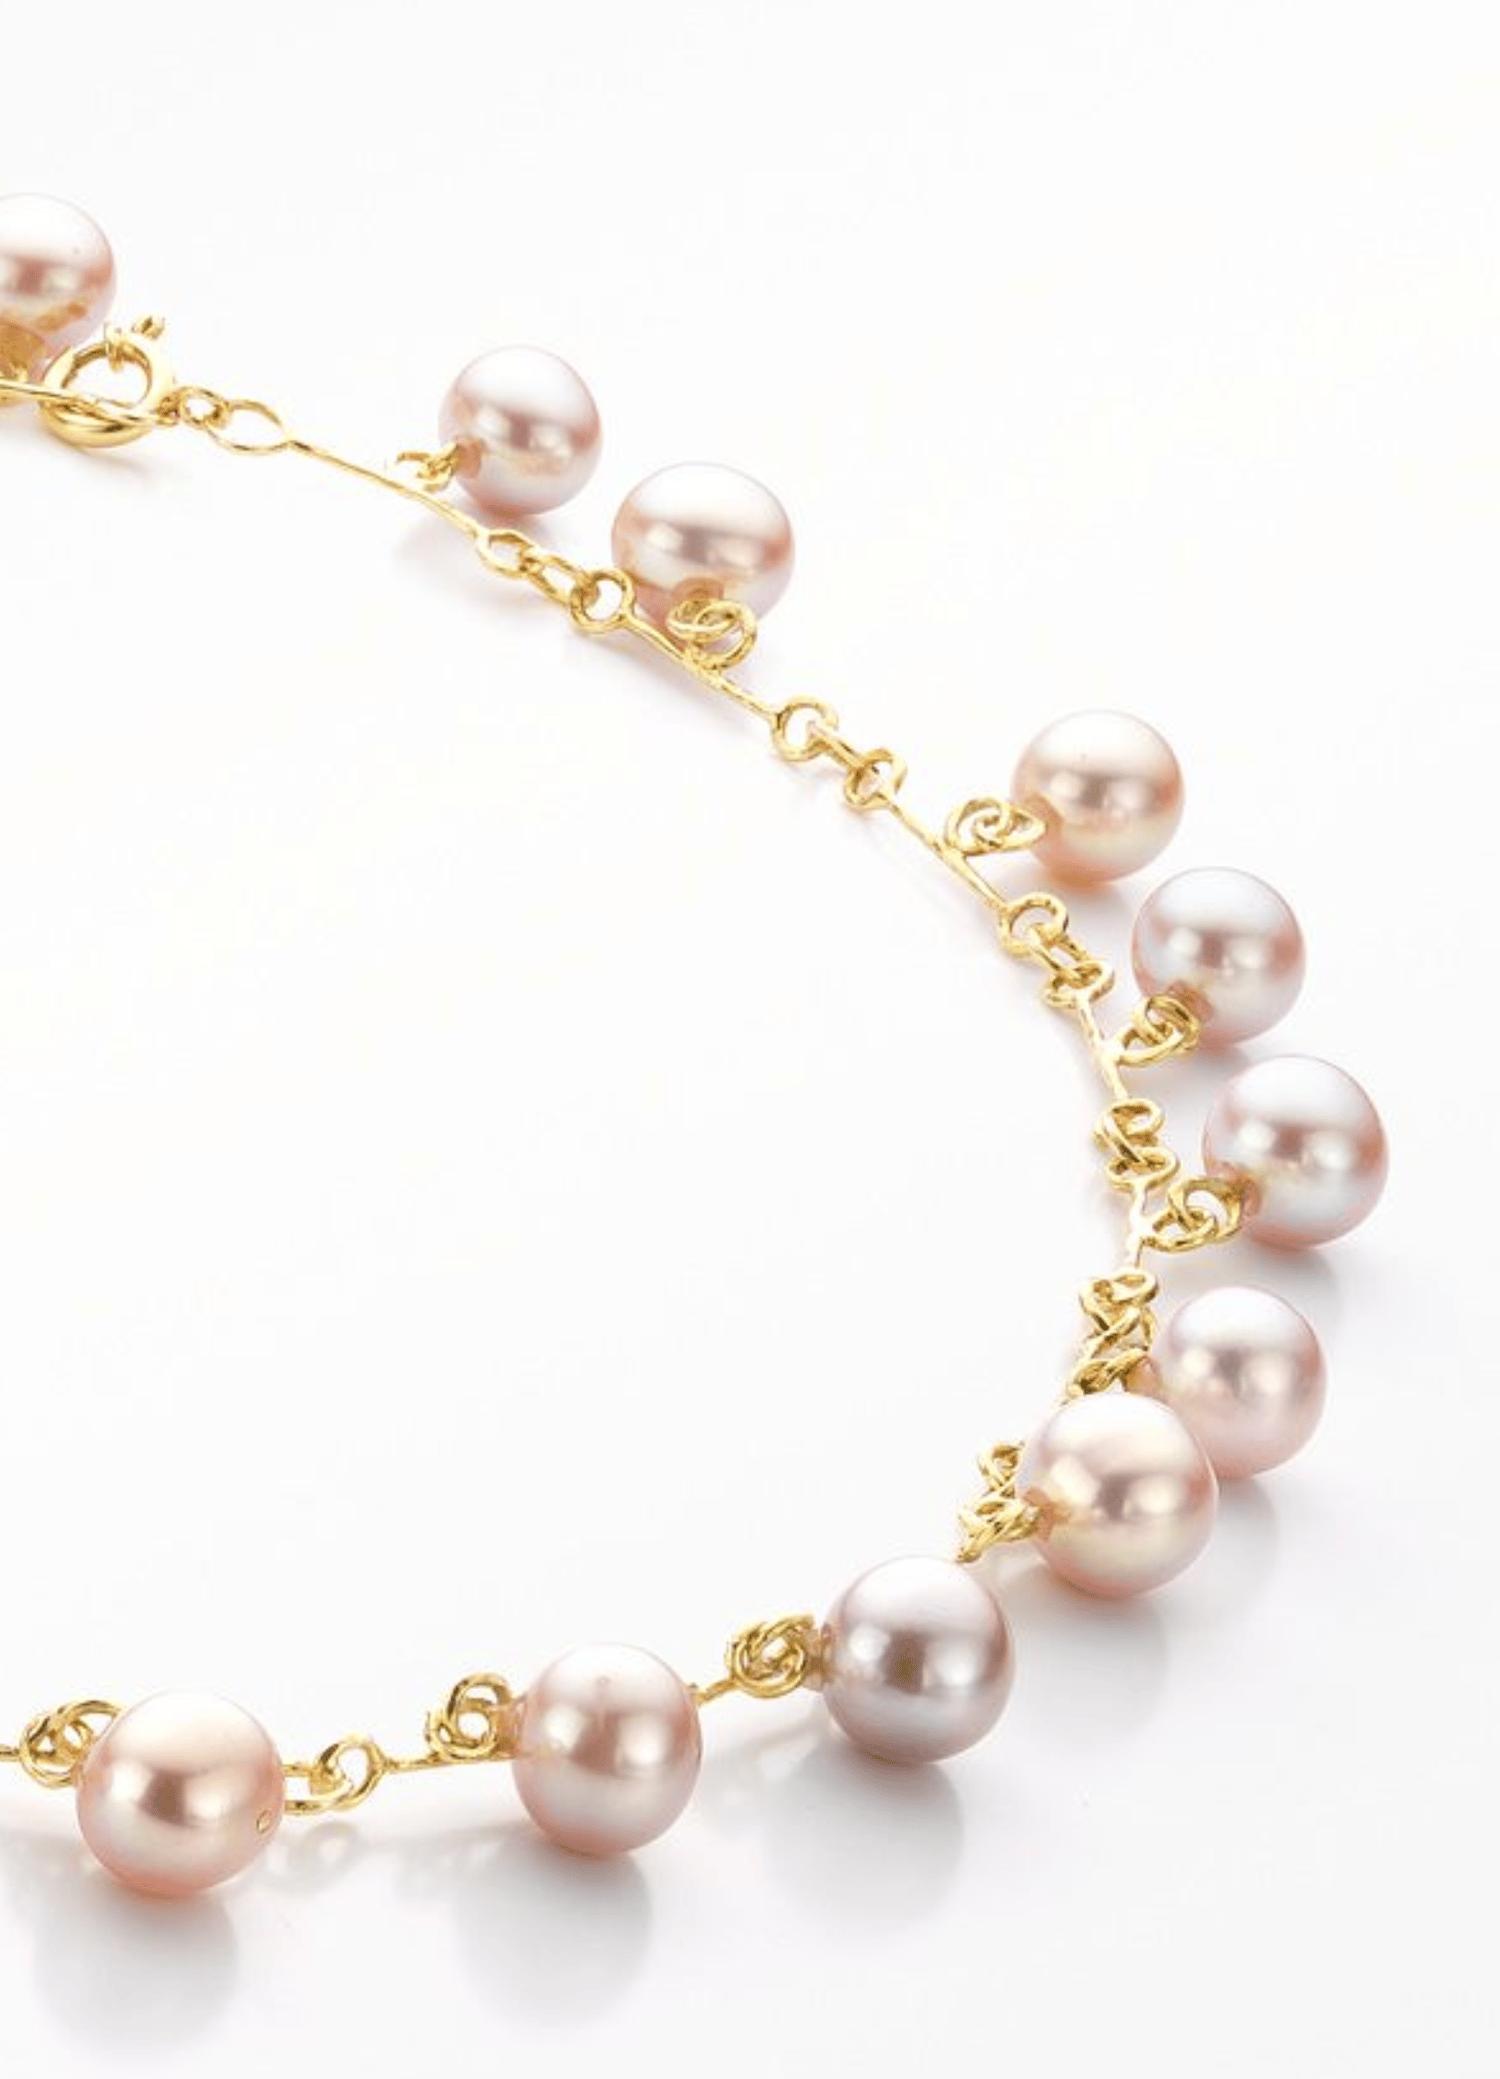 Image of 'Pearl' necklace gold pink pearls - parelcollier in geel goud met roze parels